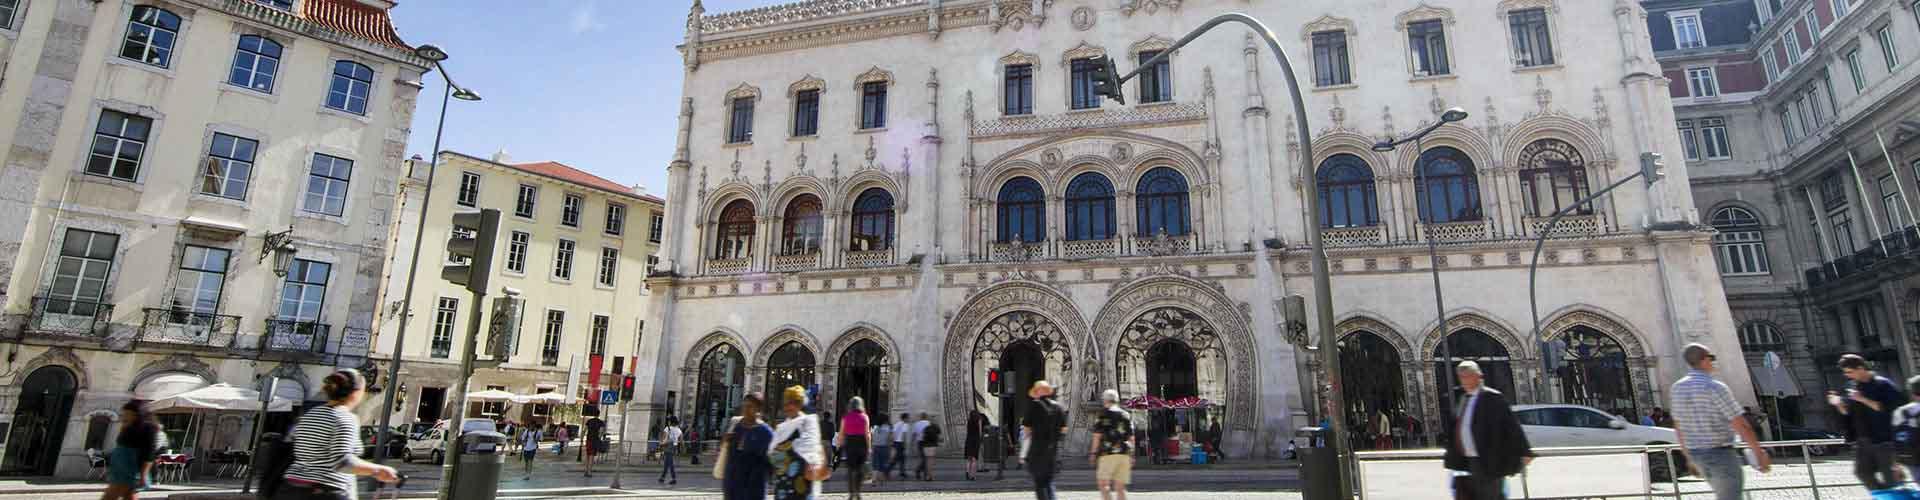 Lisboa - Hoteles baratos cerca a Estación de tren de Rossio. Mapas de Lisboa, Fotos y comentarios de cada Hotel en Lisboa.